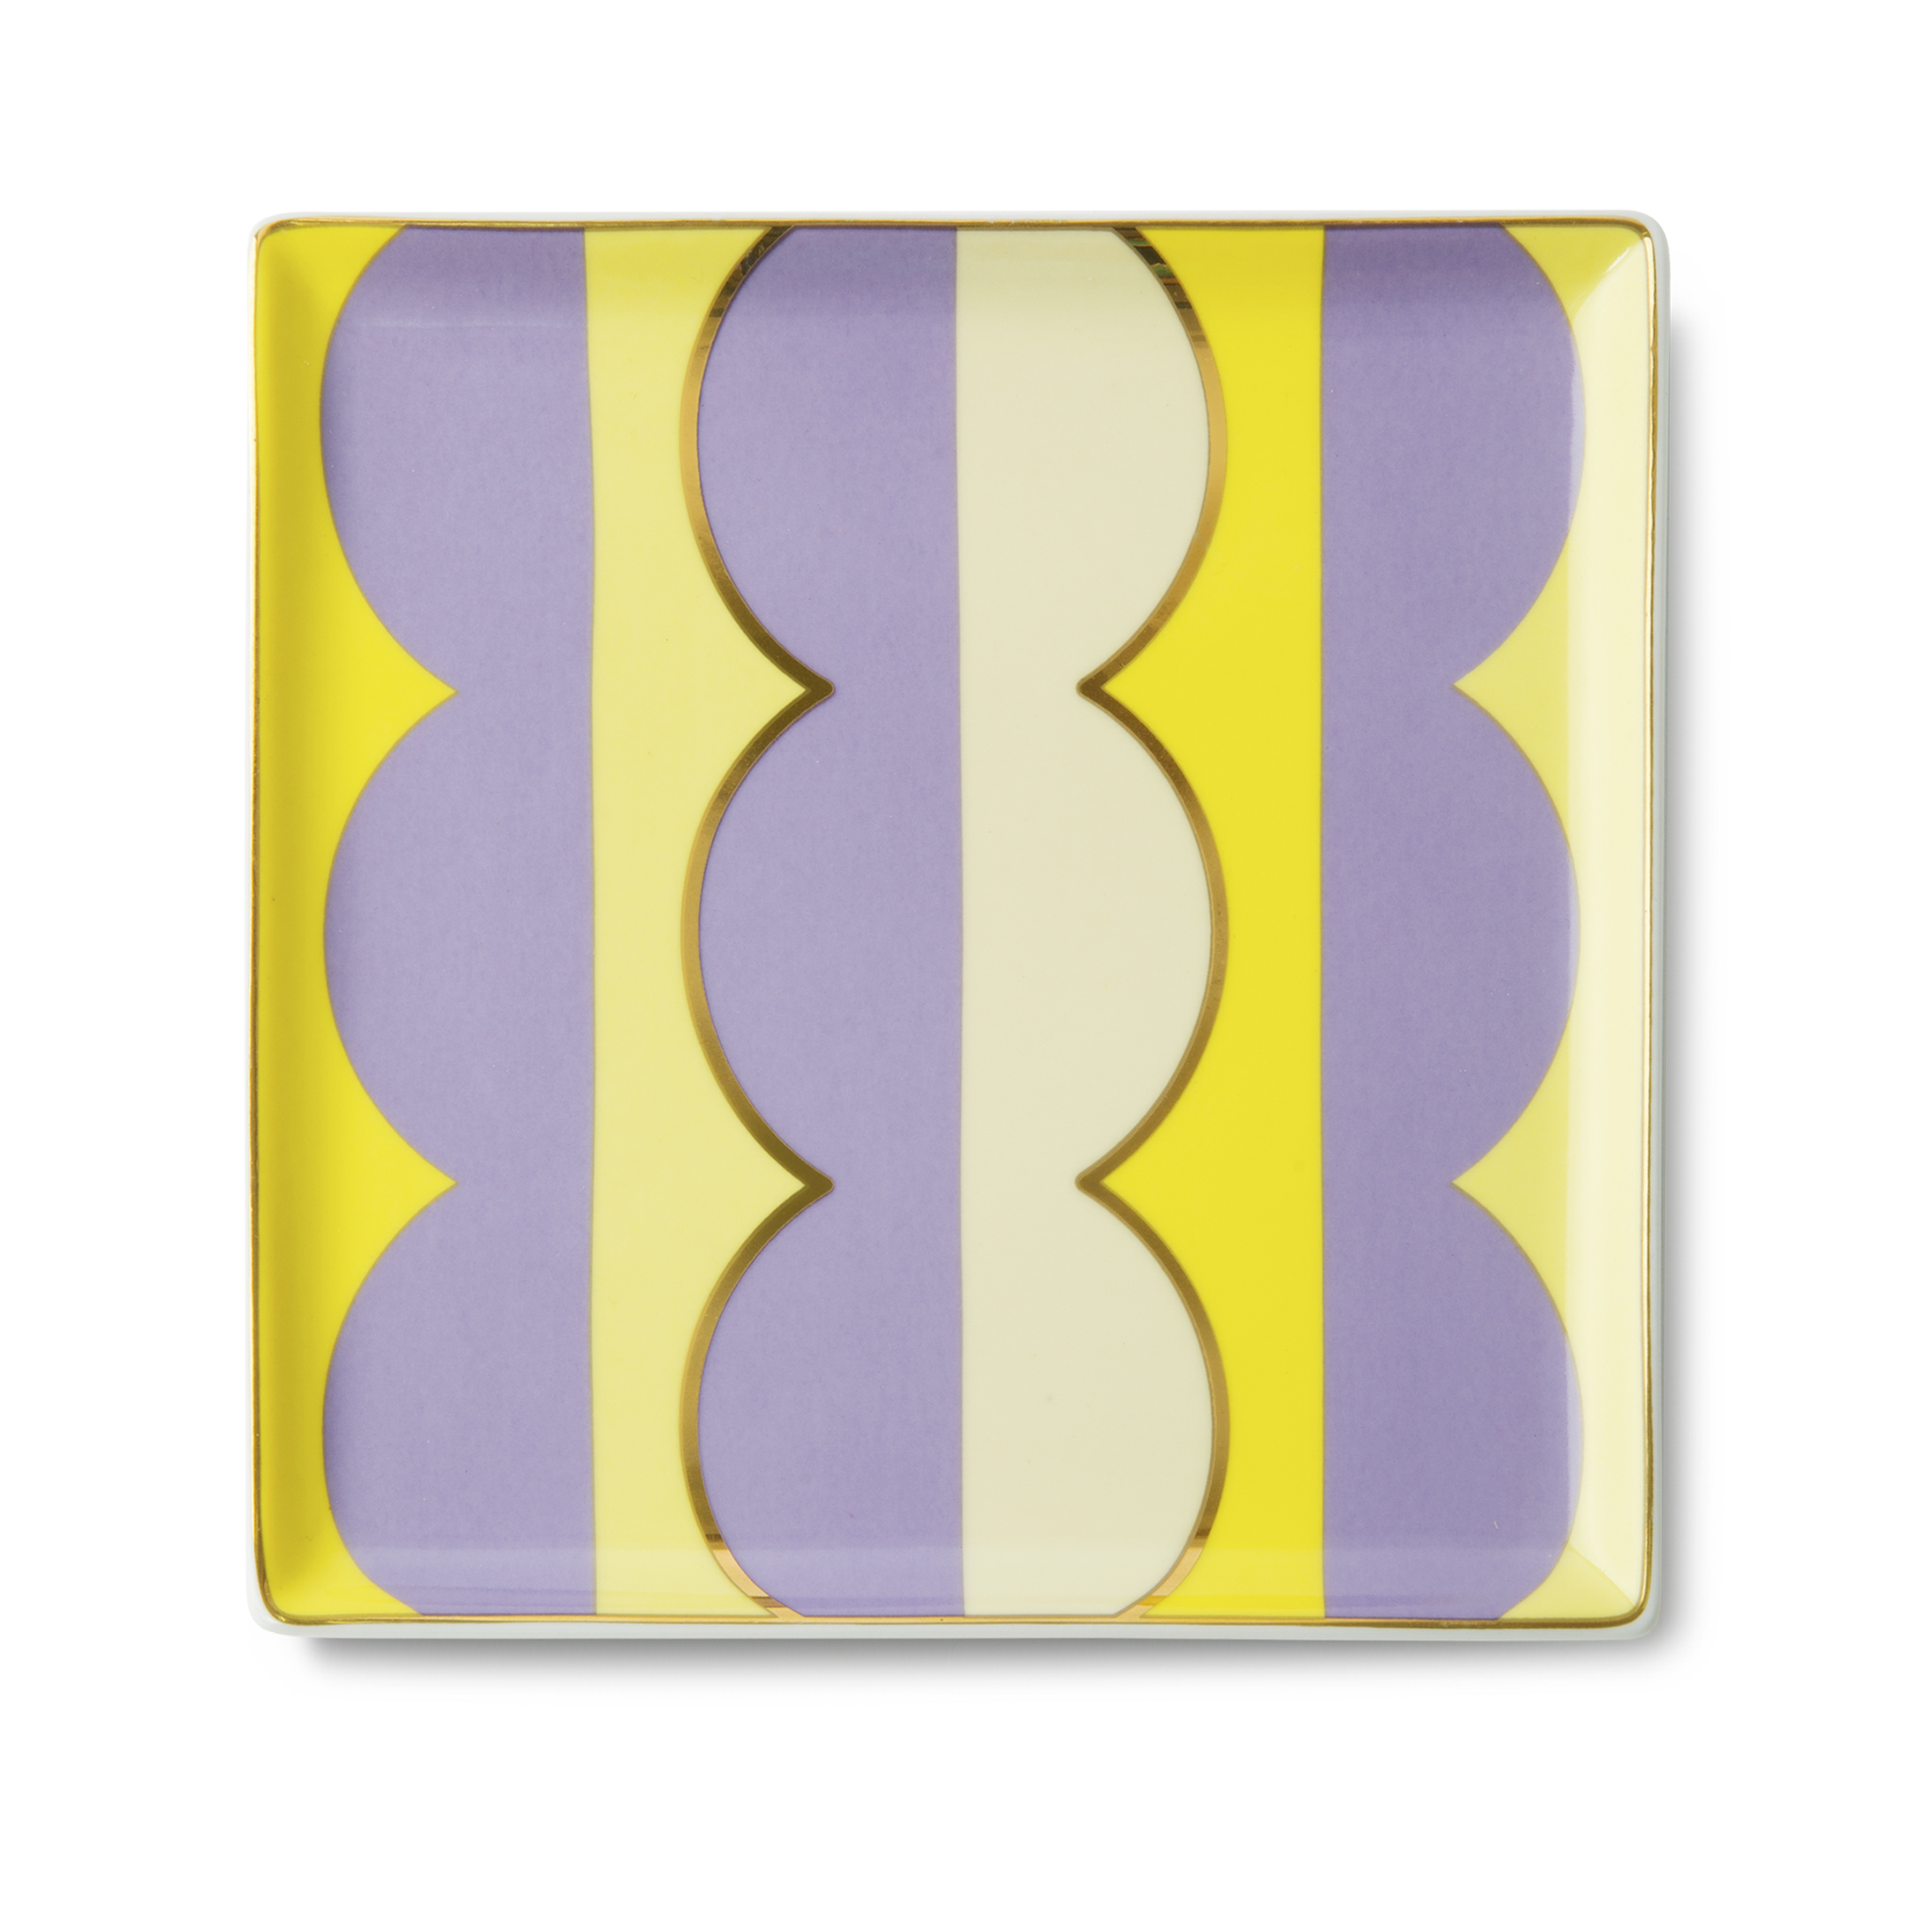 OCTRWP-20 - Ceramic Tray Riviera Wave Pink